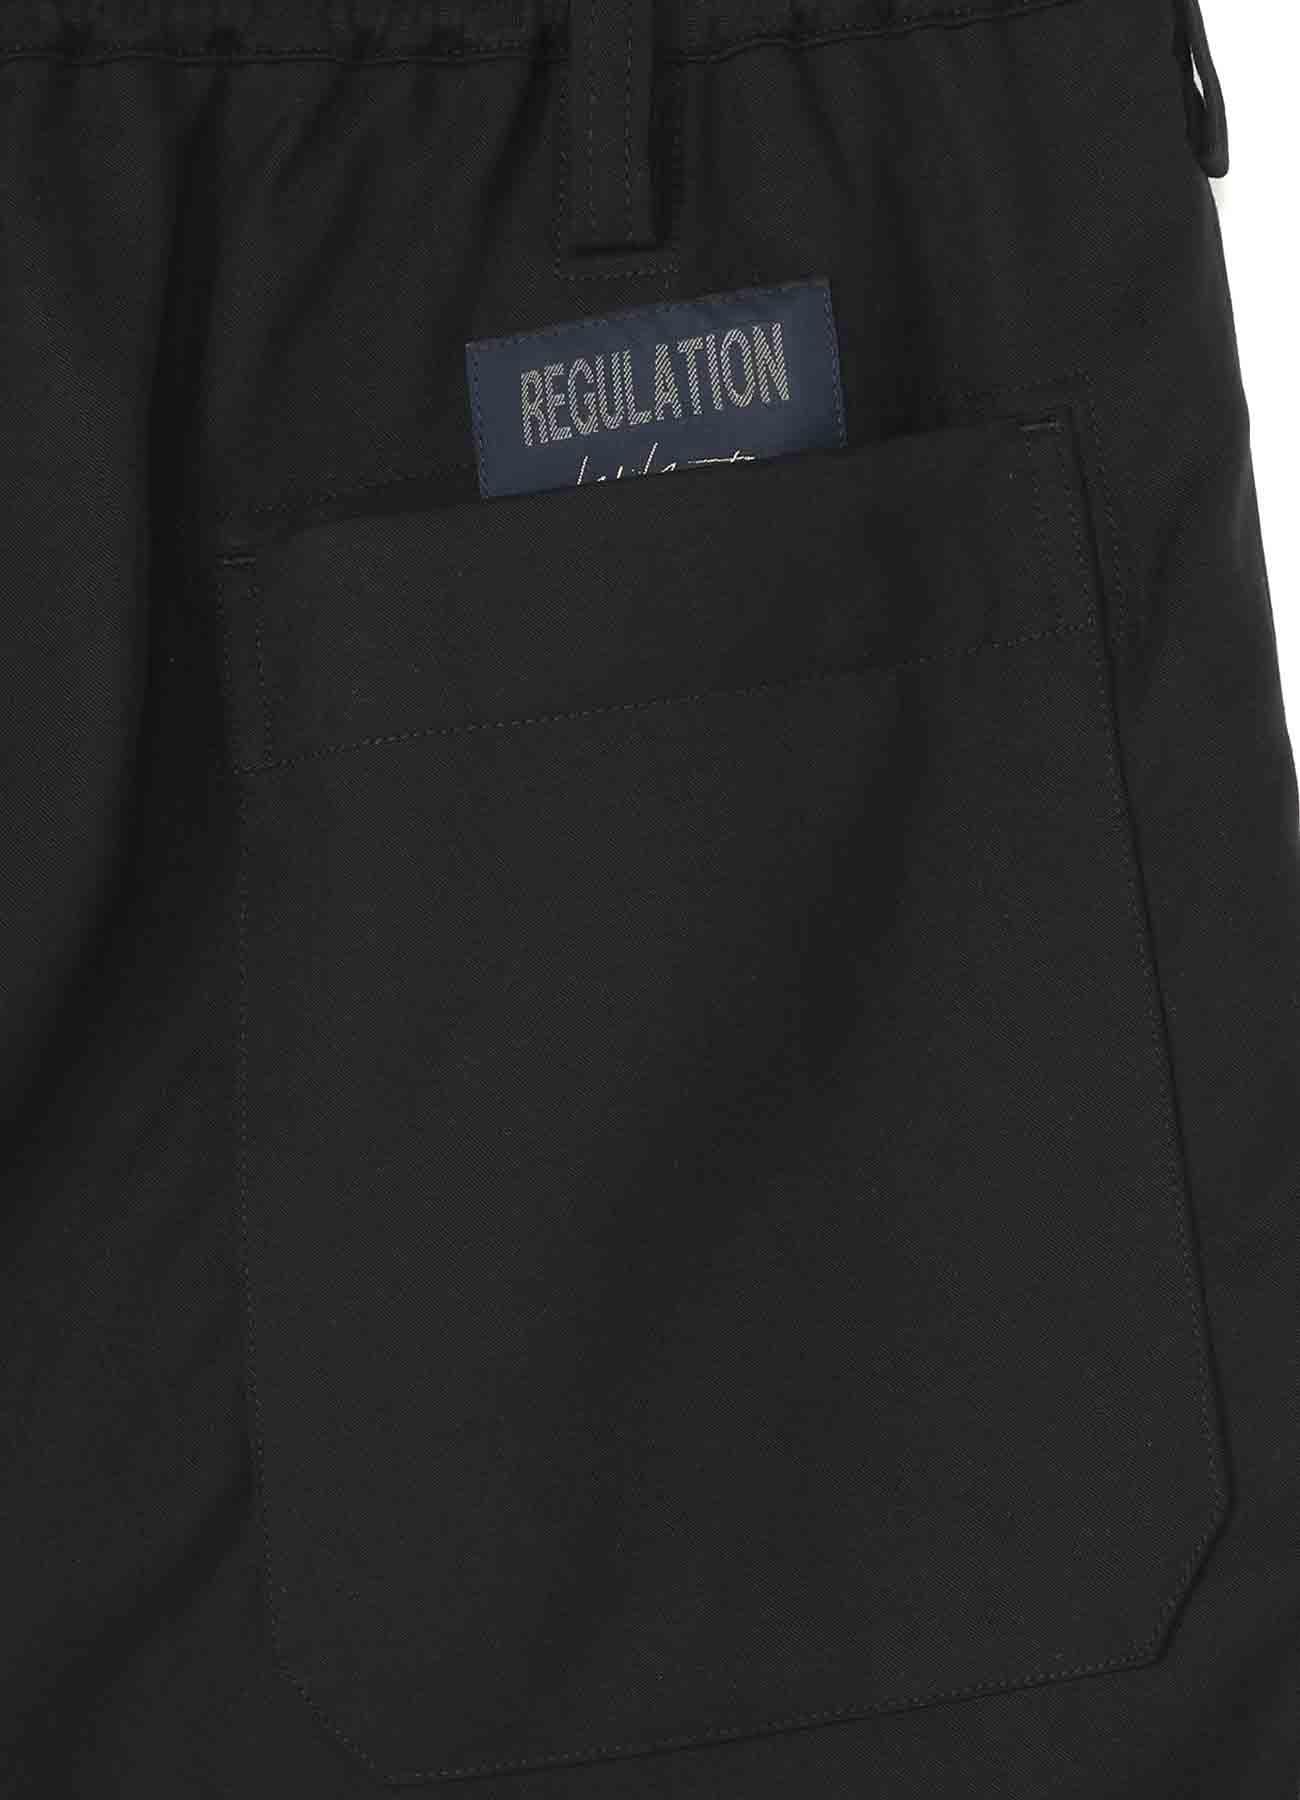 REGULATION TENCEL BURBERRY RIB FLAP POCKET PANTS